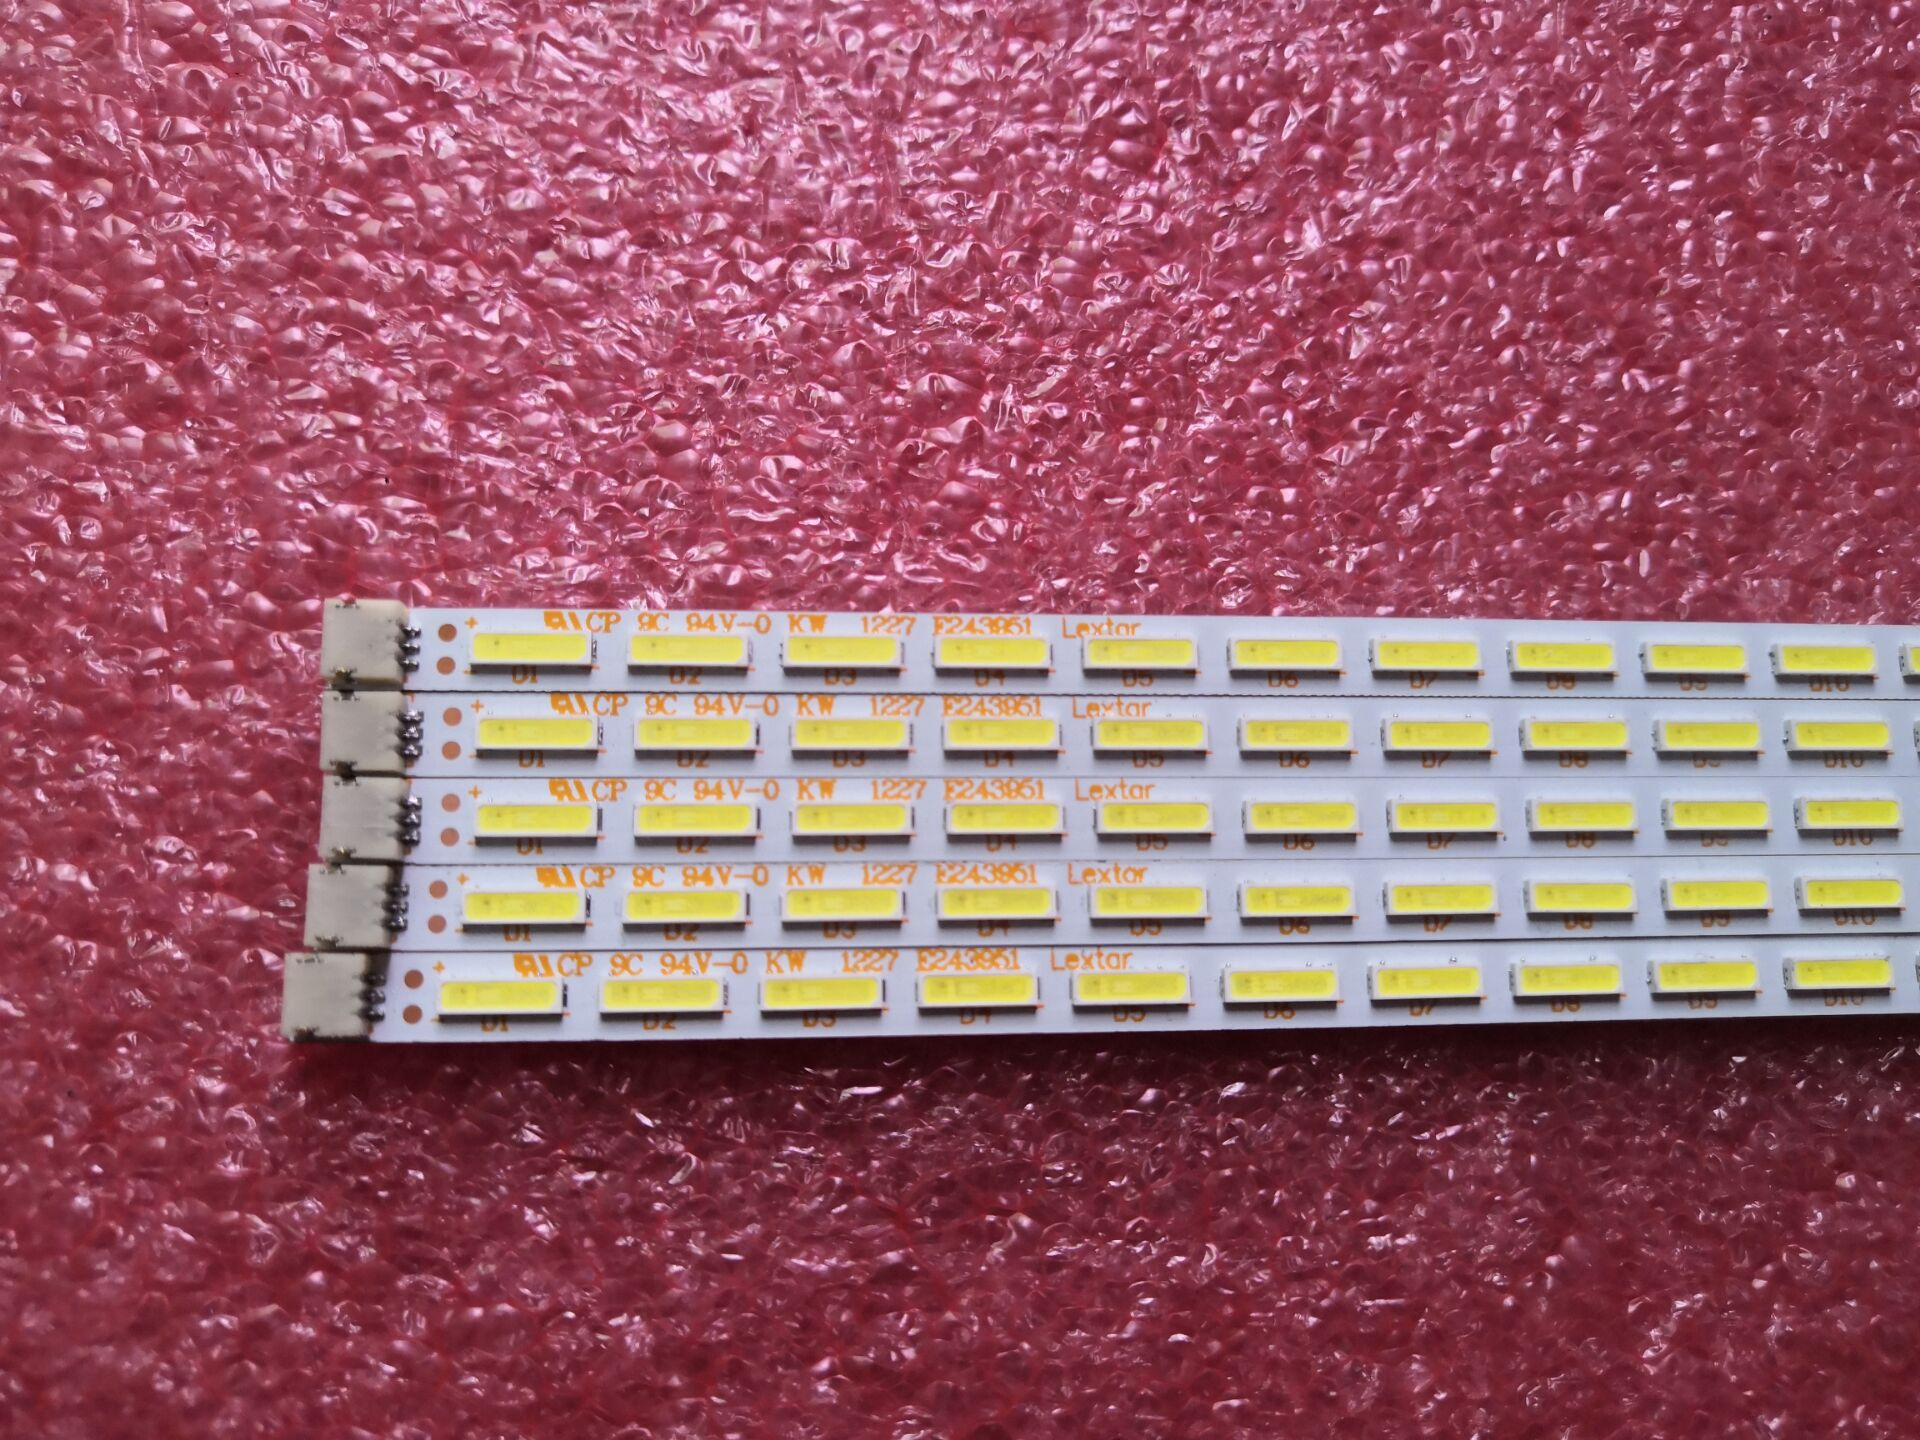 2 Pcs/Lot 100% New LCD TV Backlight Bar For Hai Er LE32A10 Article Lamp 37TM6315000008 TY-120723D SH-2 44 LEDs 410mm